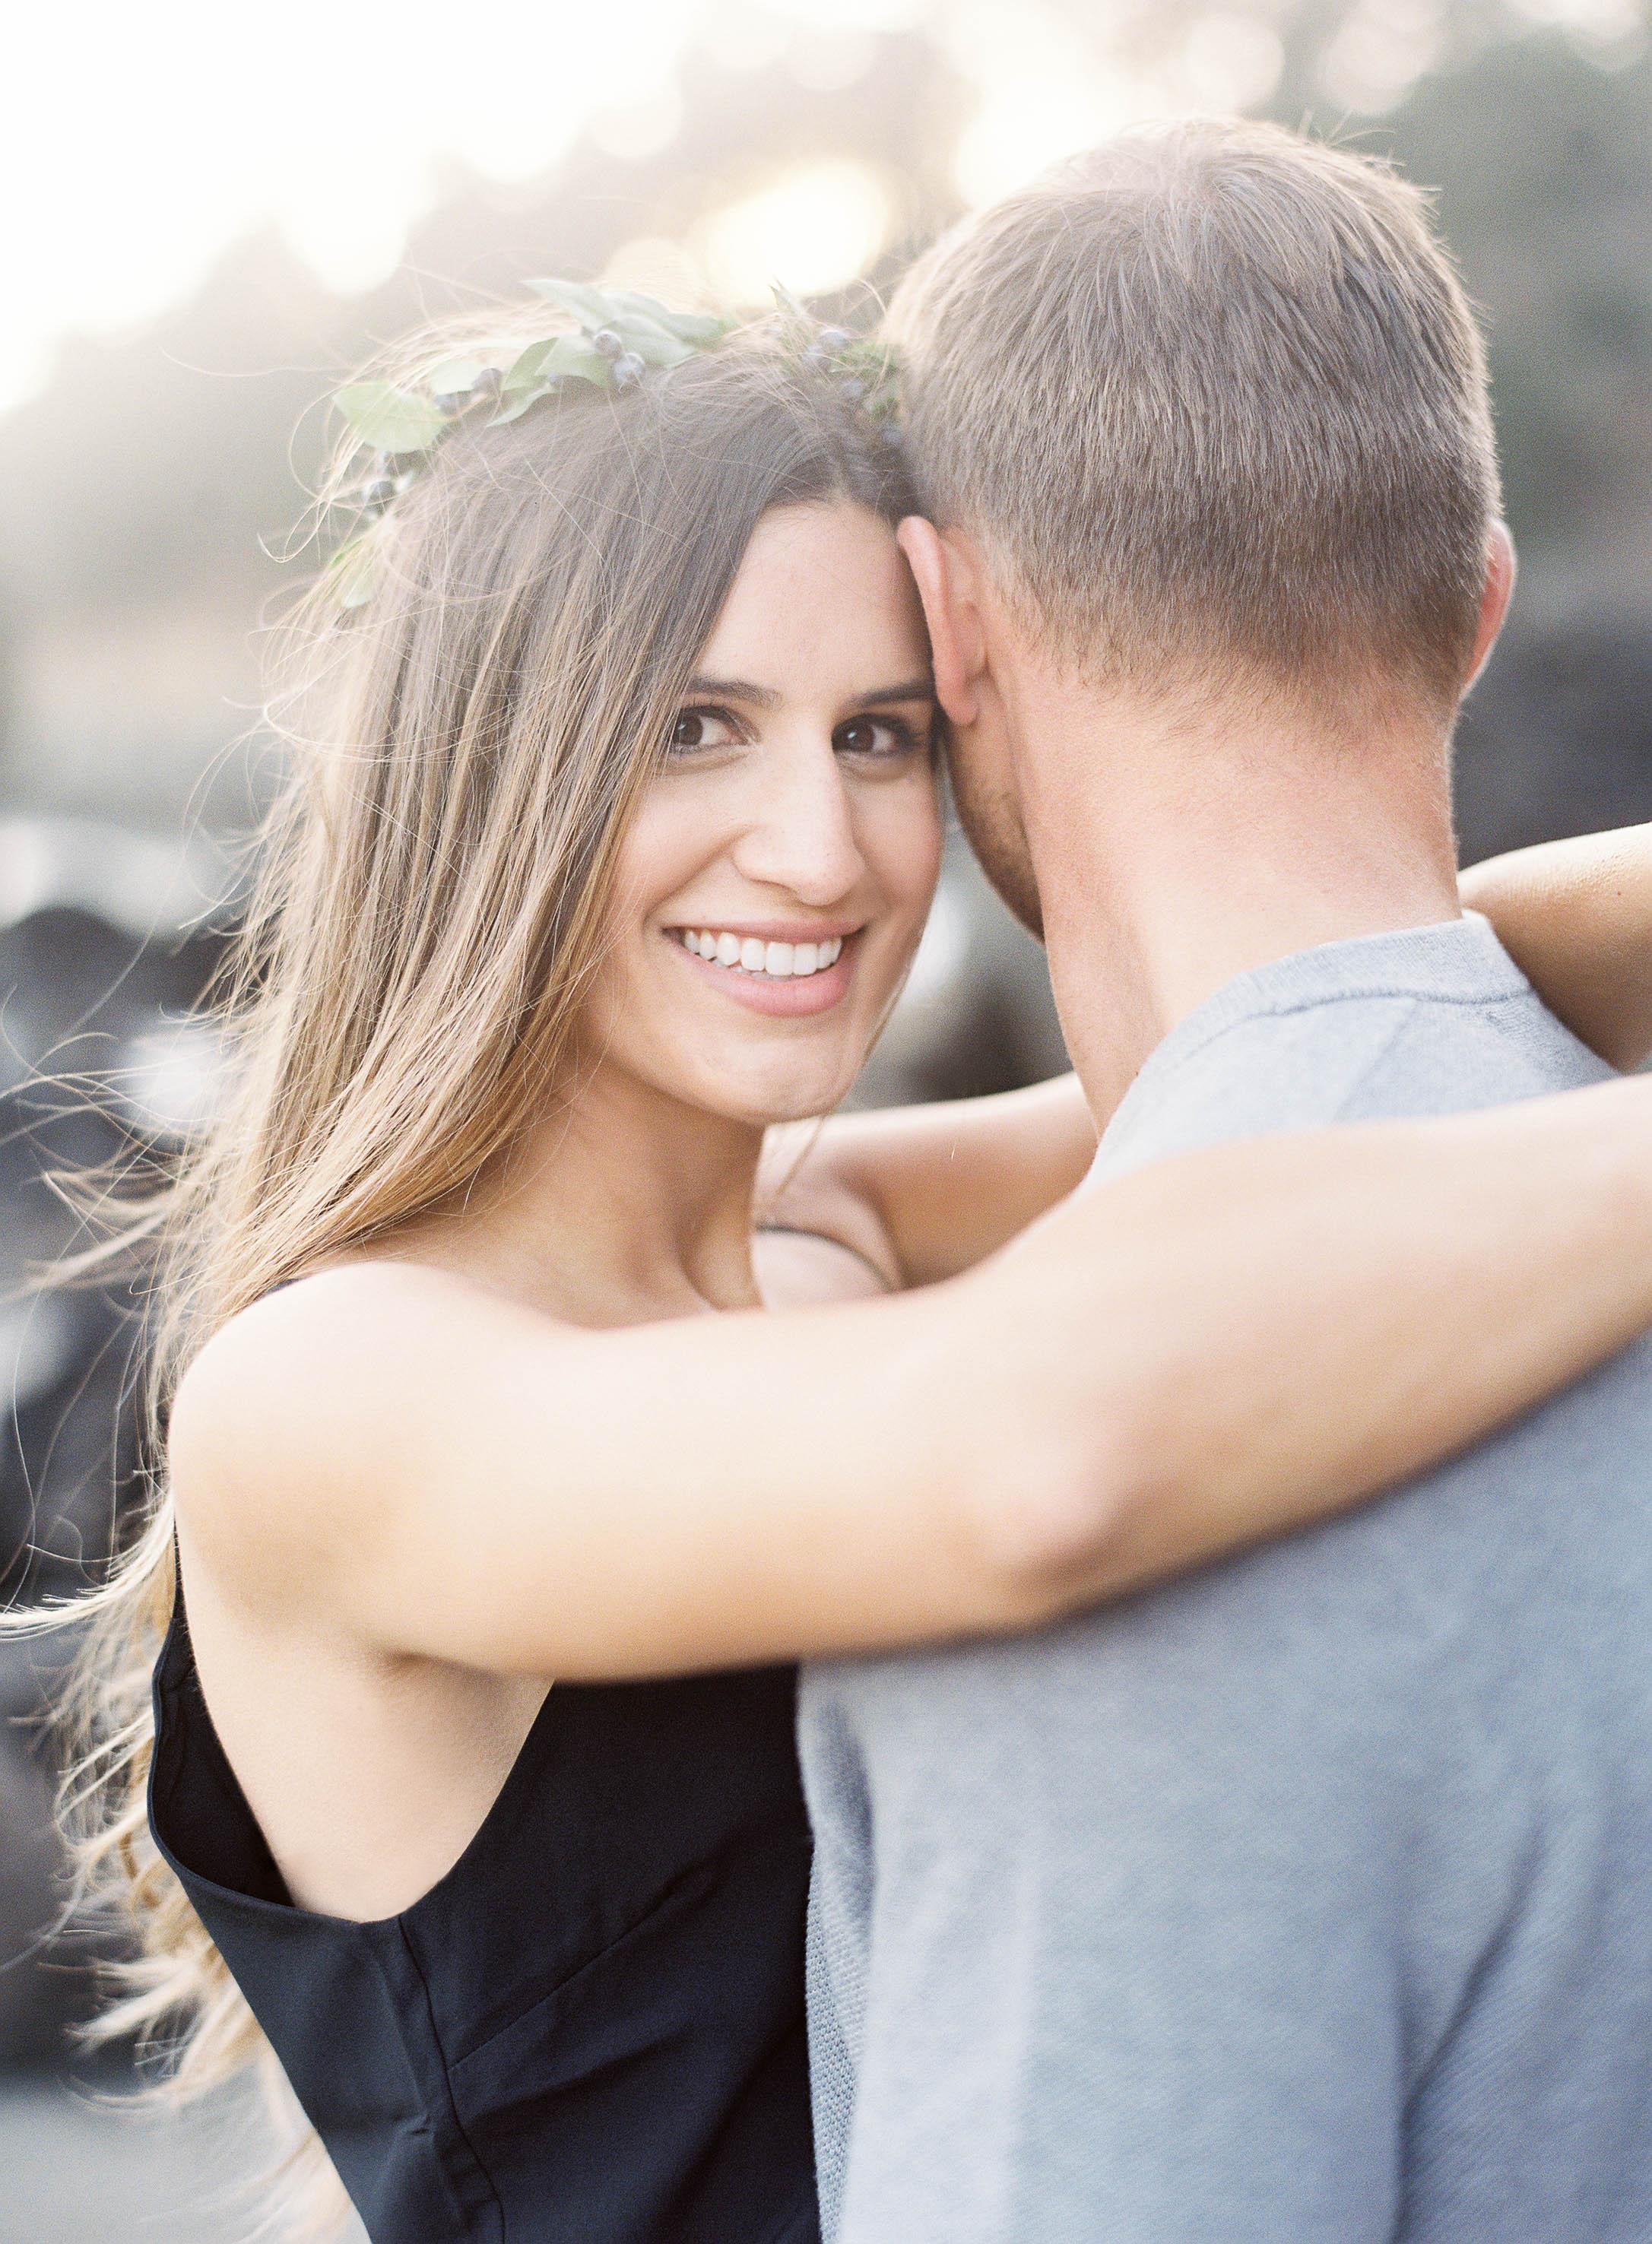 Meghan Mehan Photography - Fine Art Film Wedding Photography - San Francisco | Napa | Sonoma | Big Sur | Chicago | Minneapolis | Milwaukee | Lake Geneva | Door County | Wisconsin 001.jpg